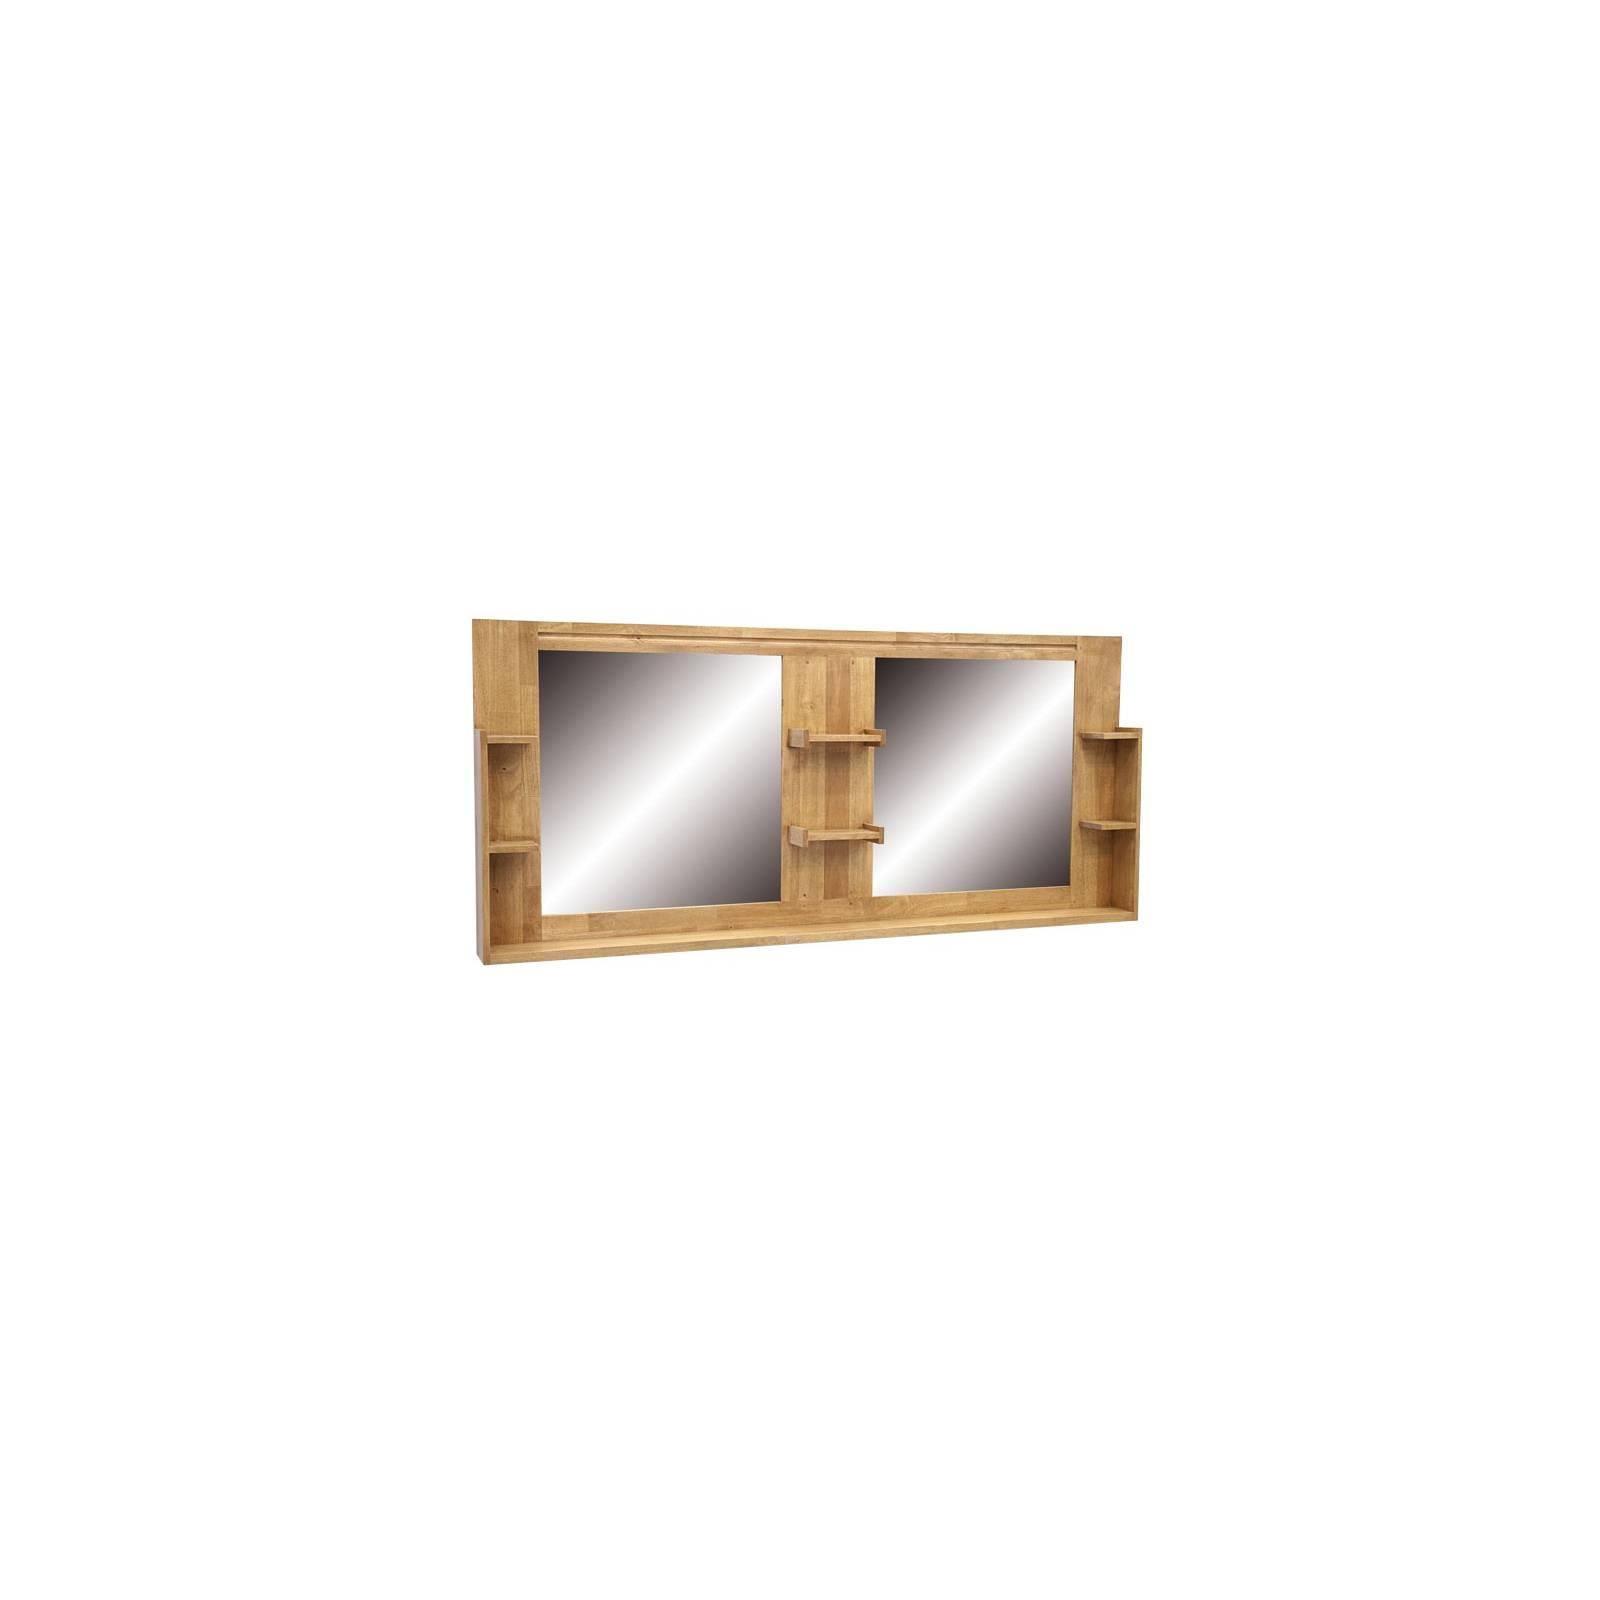 Miroir Salle De Bain Fjord Hévéa - meuble déco